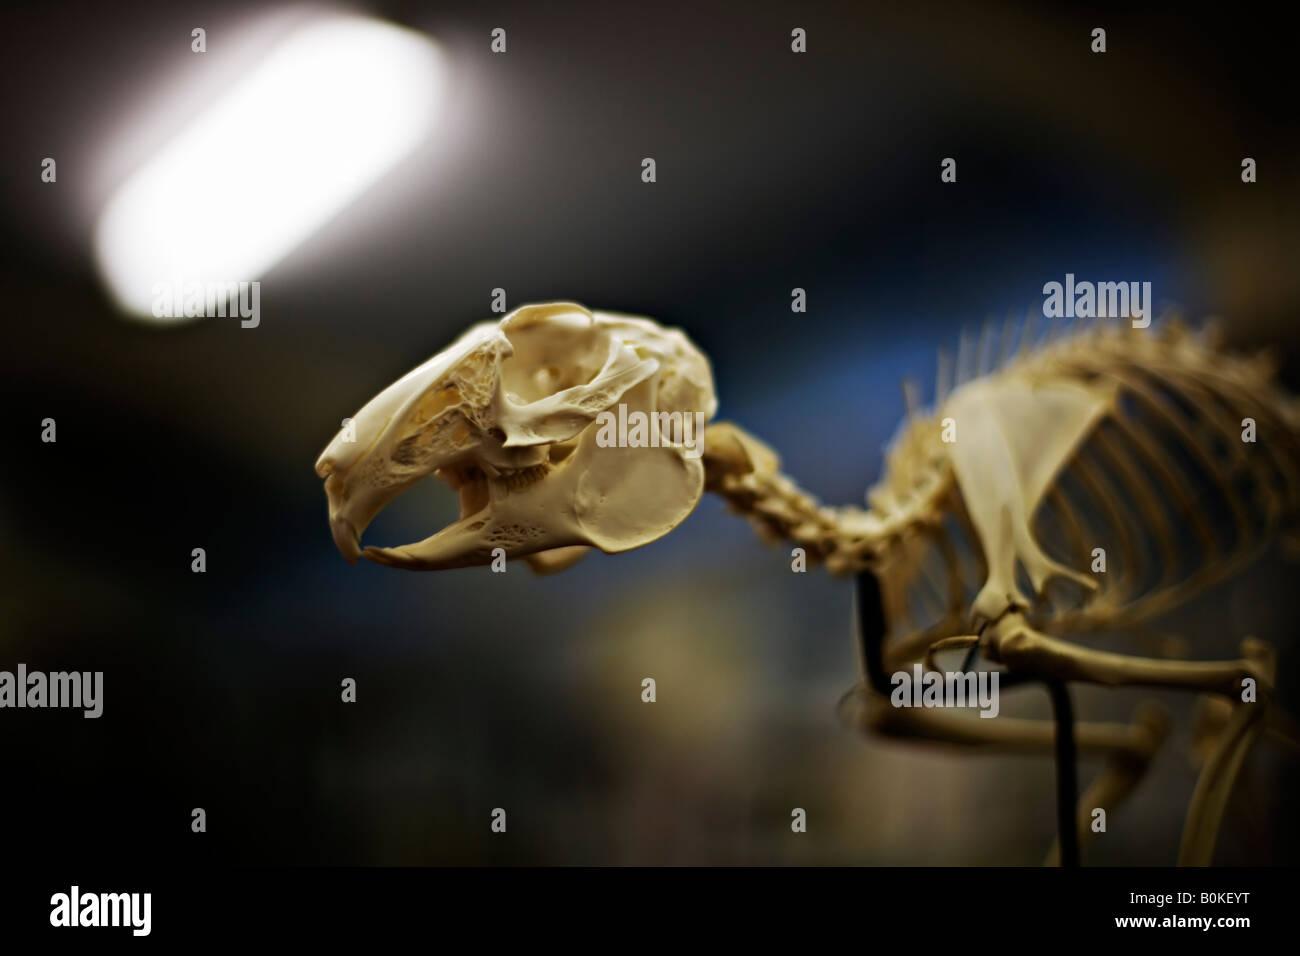 Rabbit skeleton in a school classroom - Stock Image